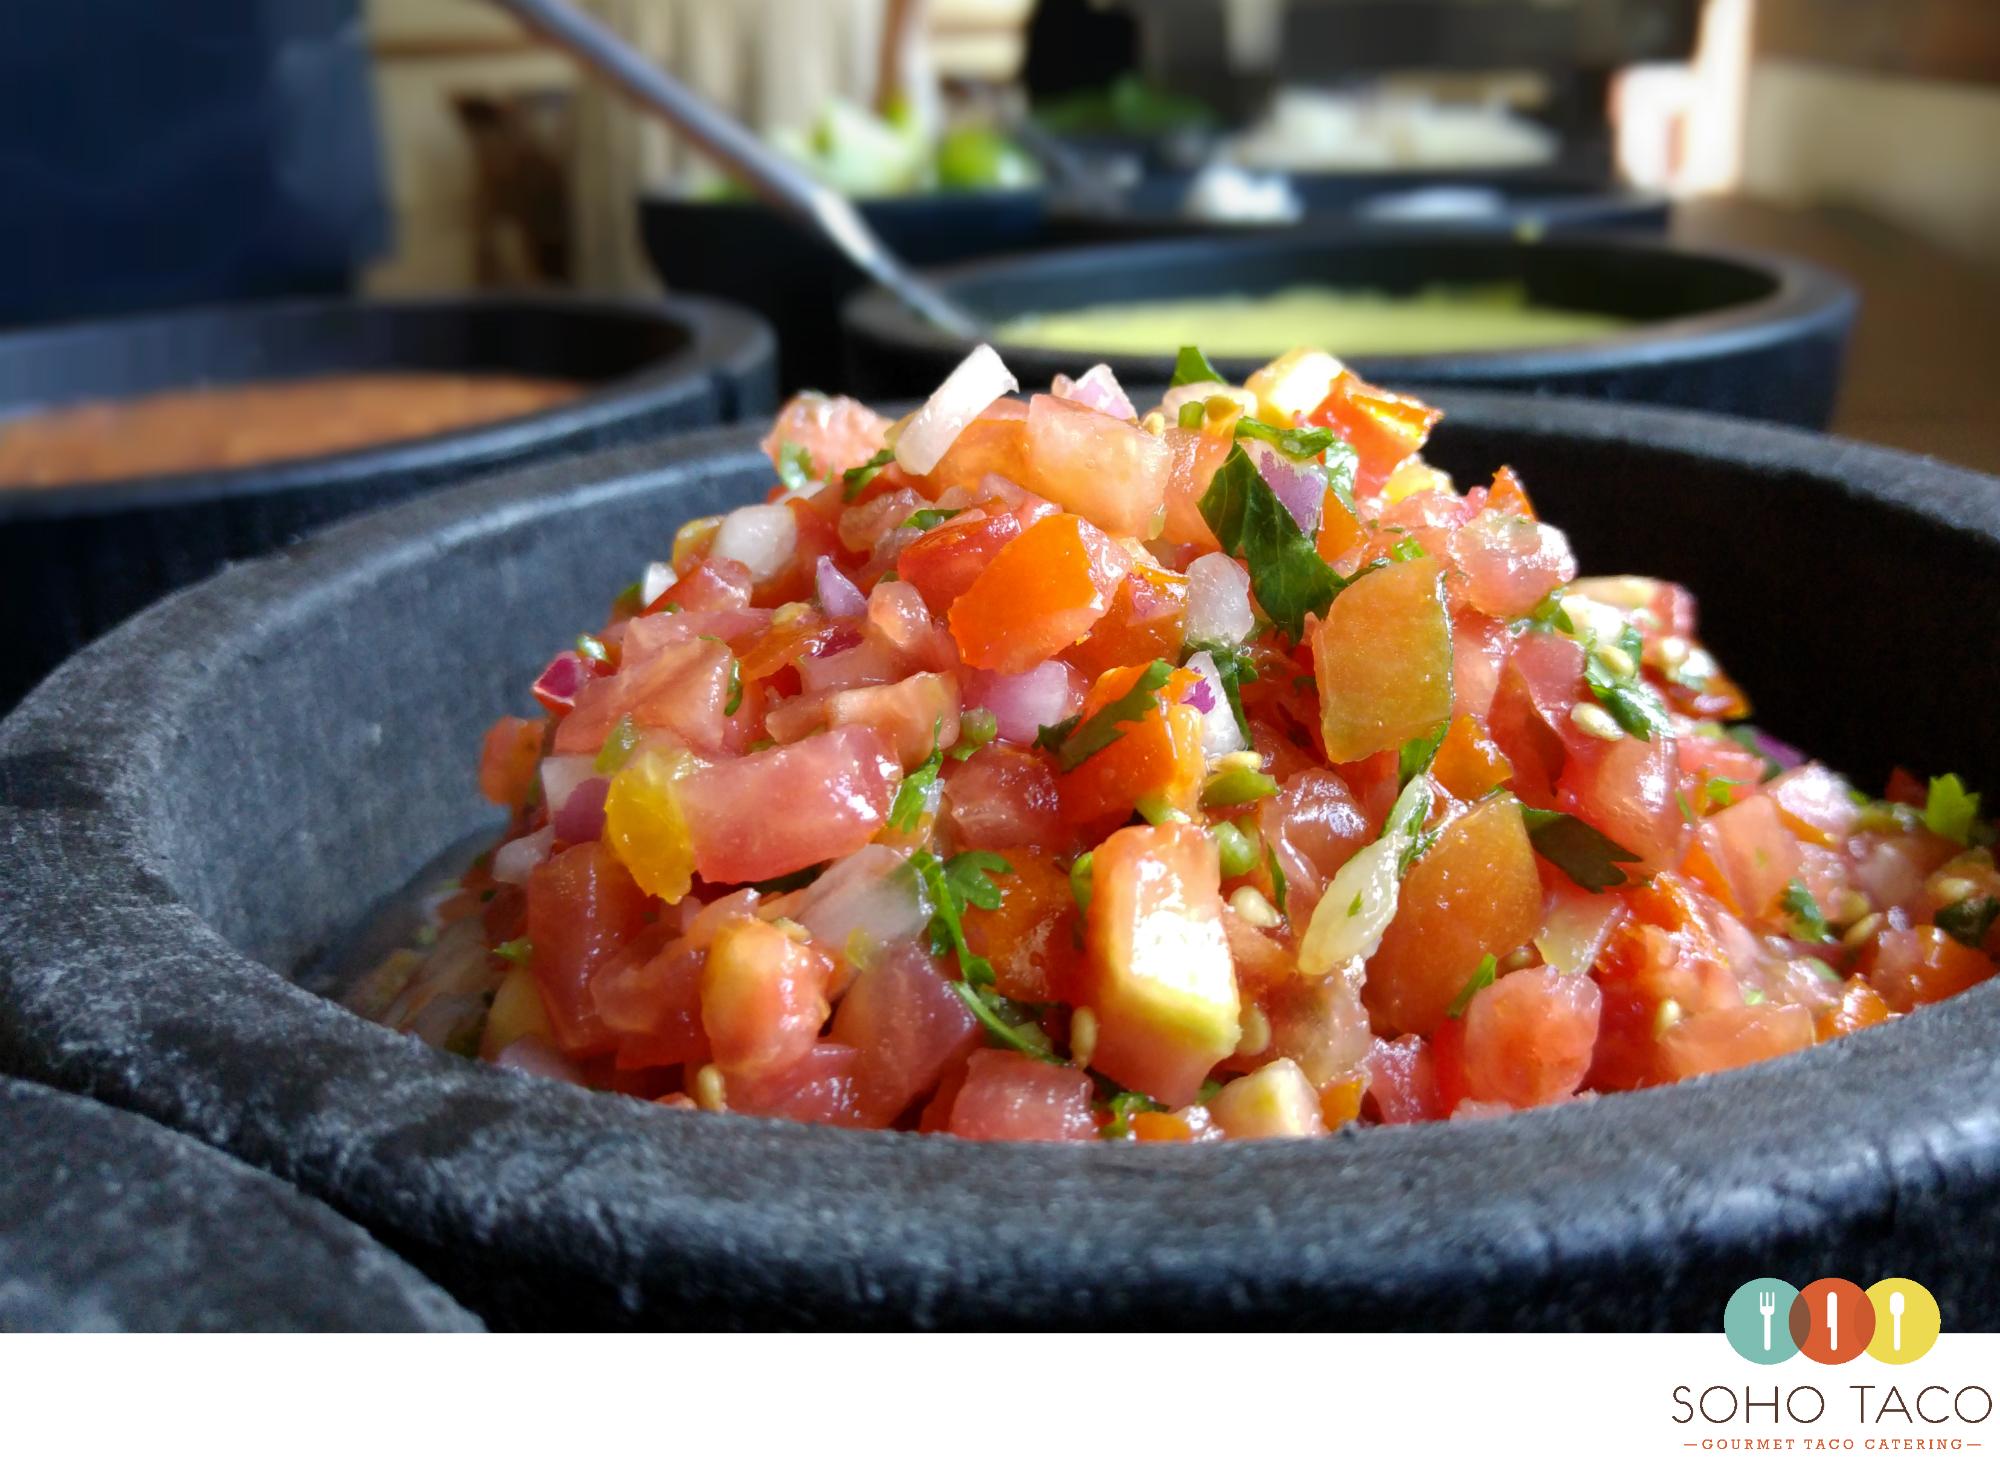 SOHO TACO Gourmet Taco Catering - Earl Warren Showgrounds - Santa Barbara - Pico De Gallo